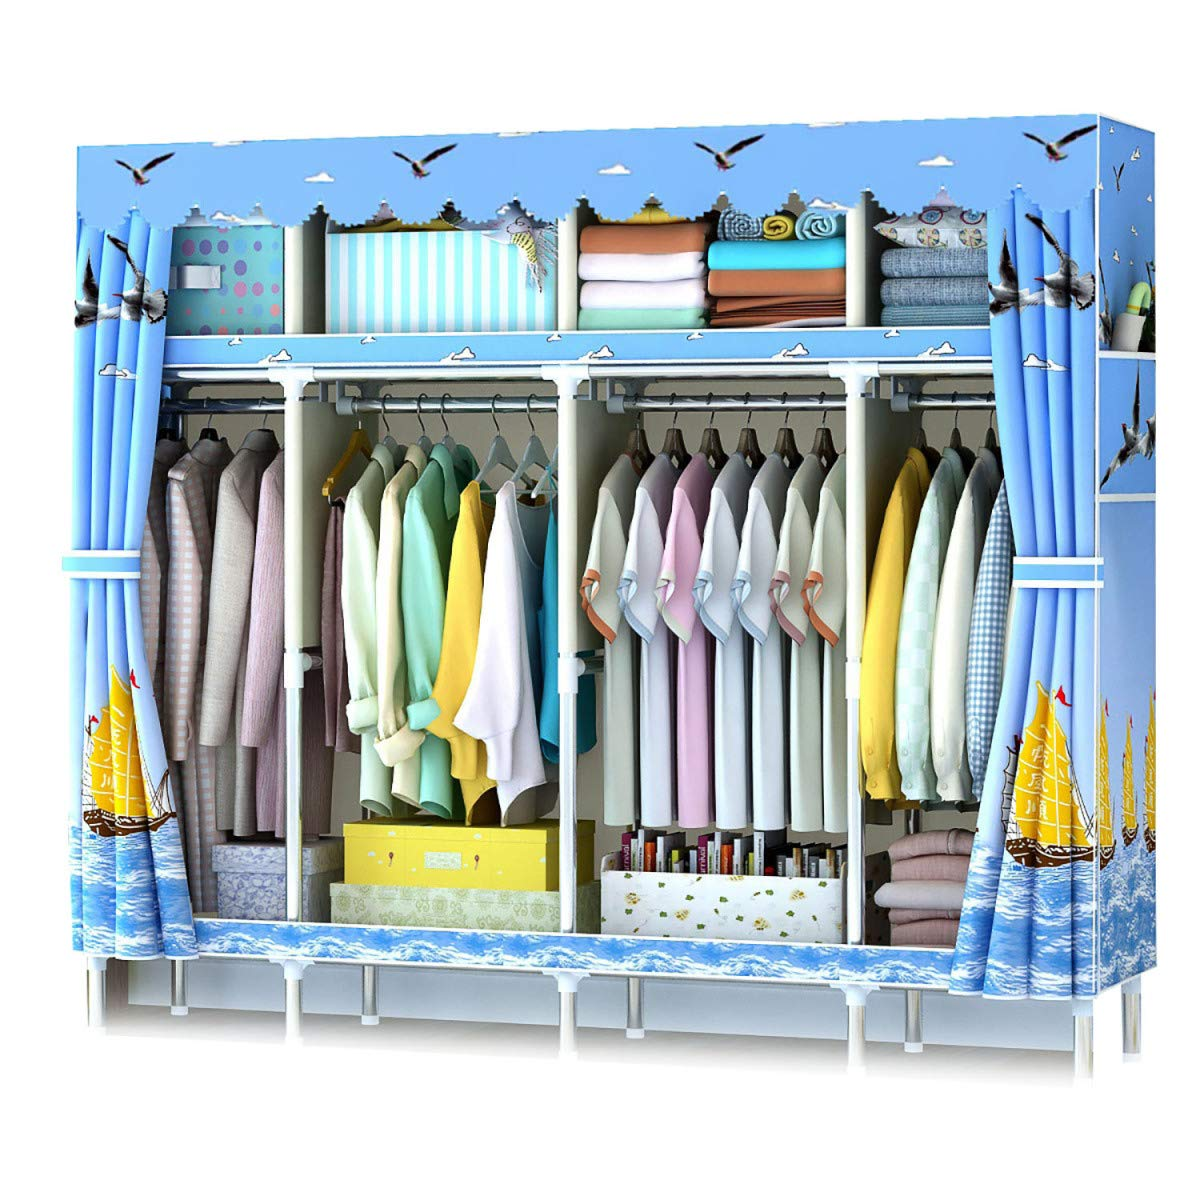 HSBAIS 衣服クローゼットオーガナイザーとストレージ、布製ワードローブ棚、寝室、防湿および防虫用クローゼットシステム,B_79.9x17.7x66.9inch B07KK5M8ST B 79.9x17.7x66.9inch